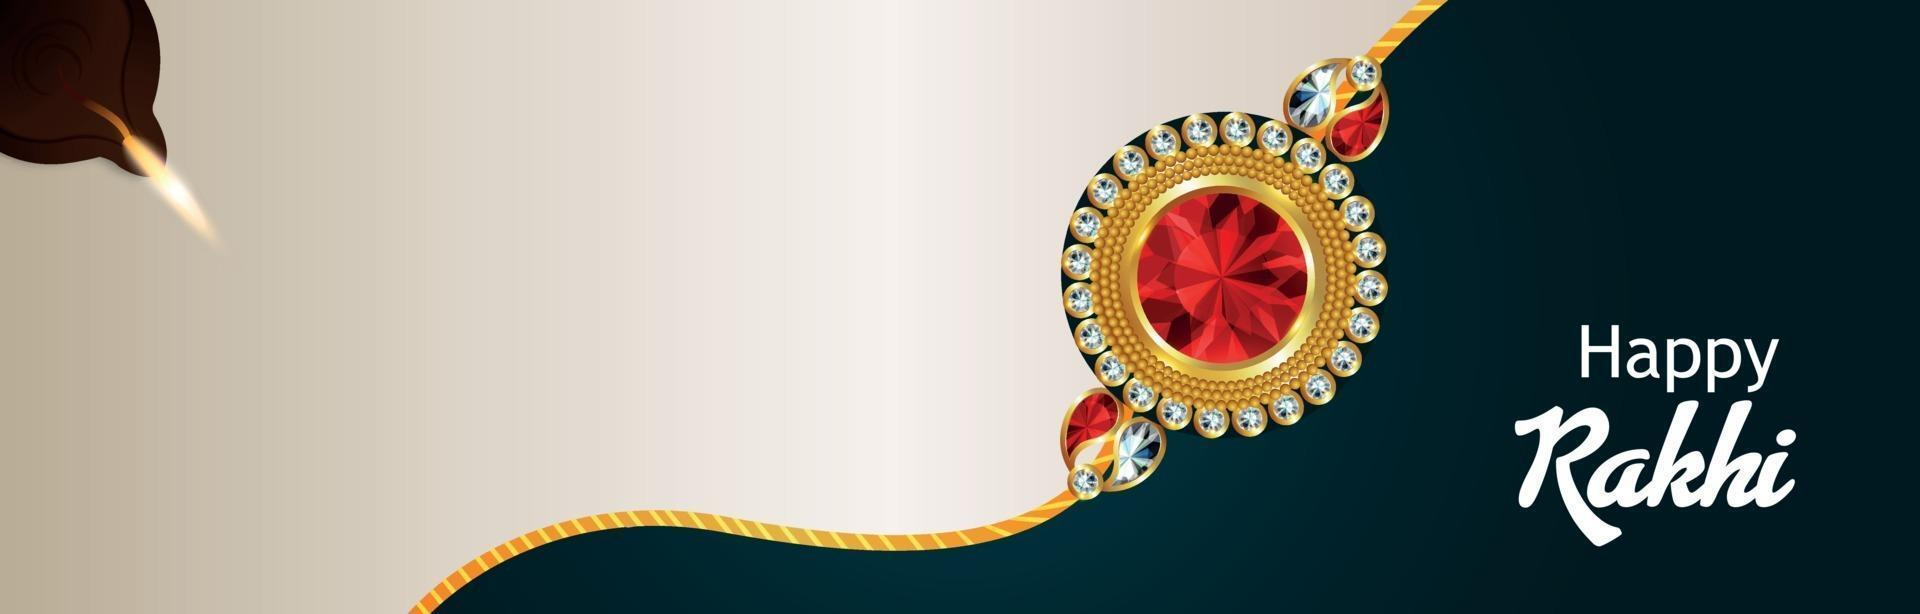 indisk festival fest på crystal rakhi och bakgrund vektor